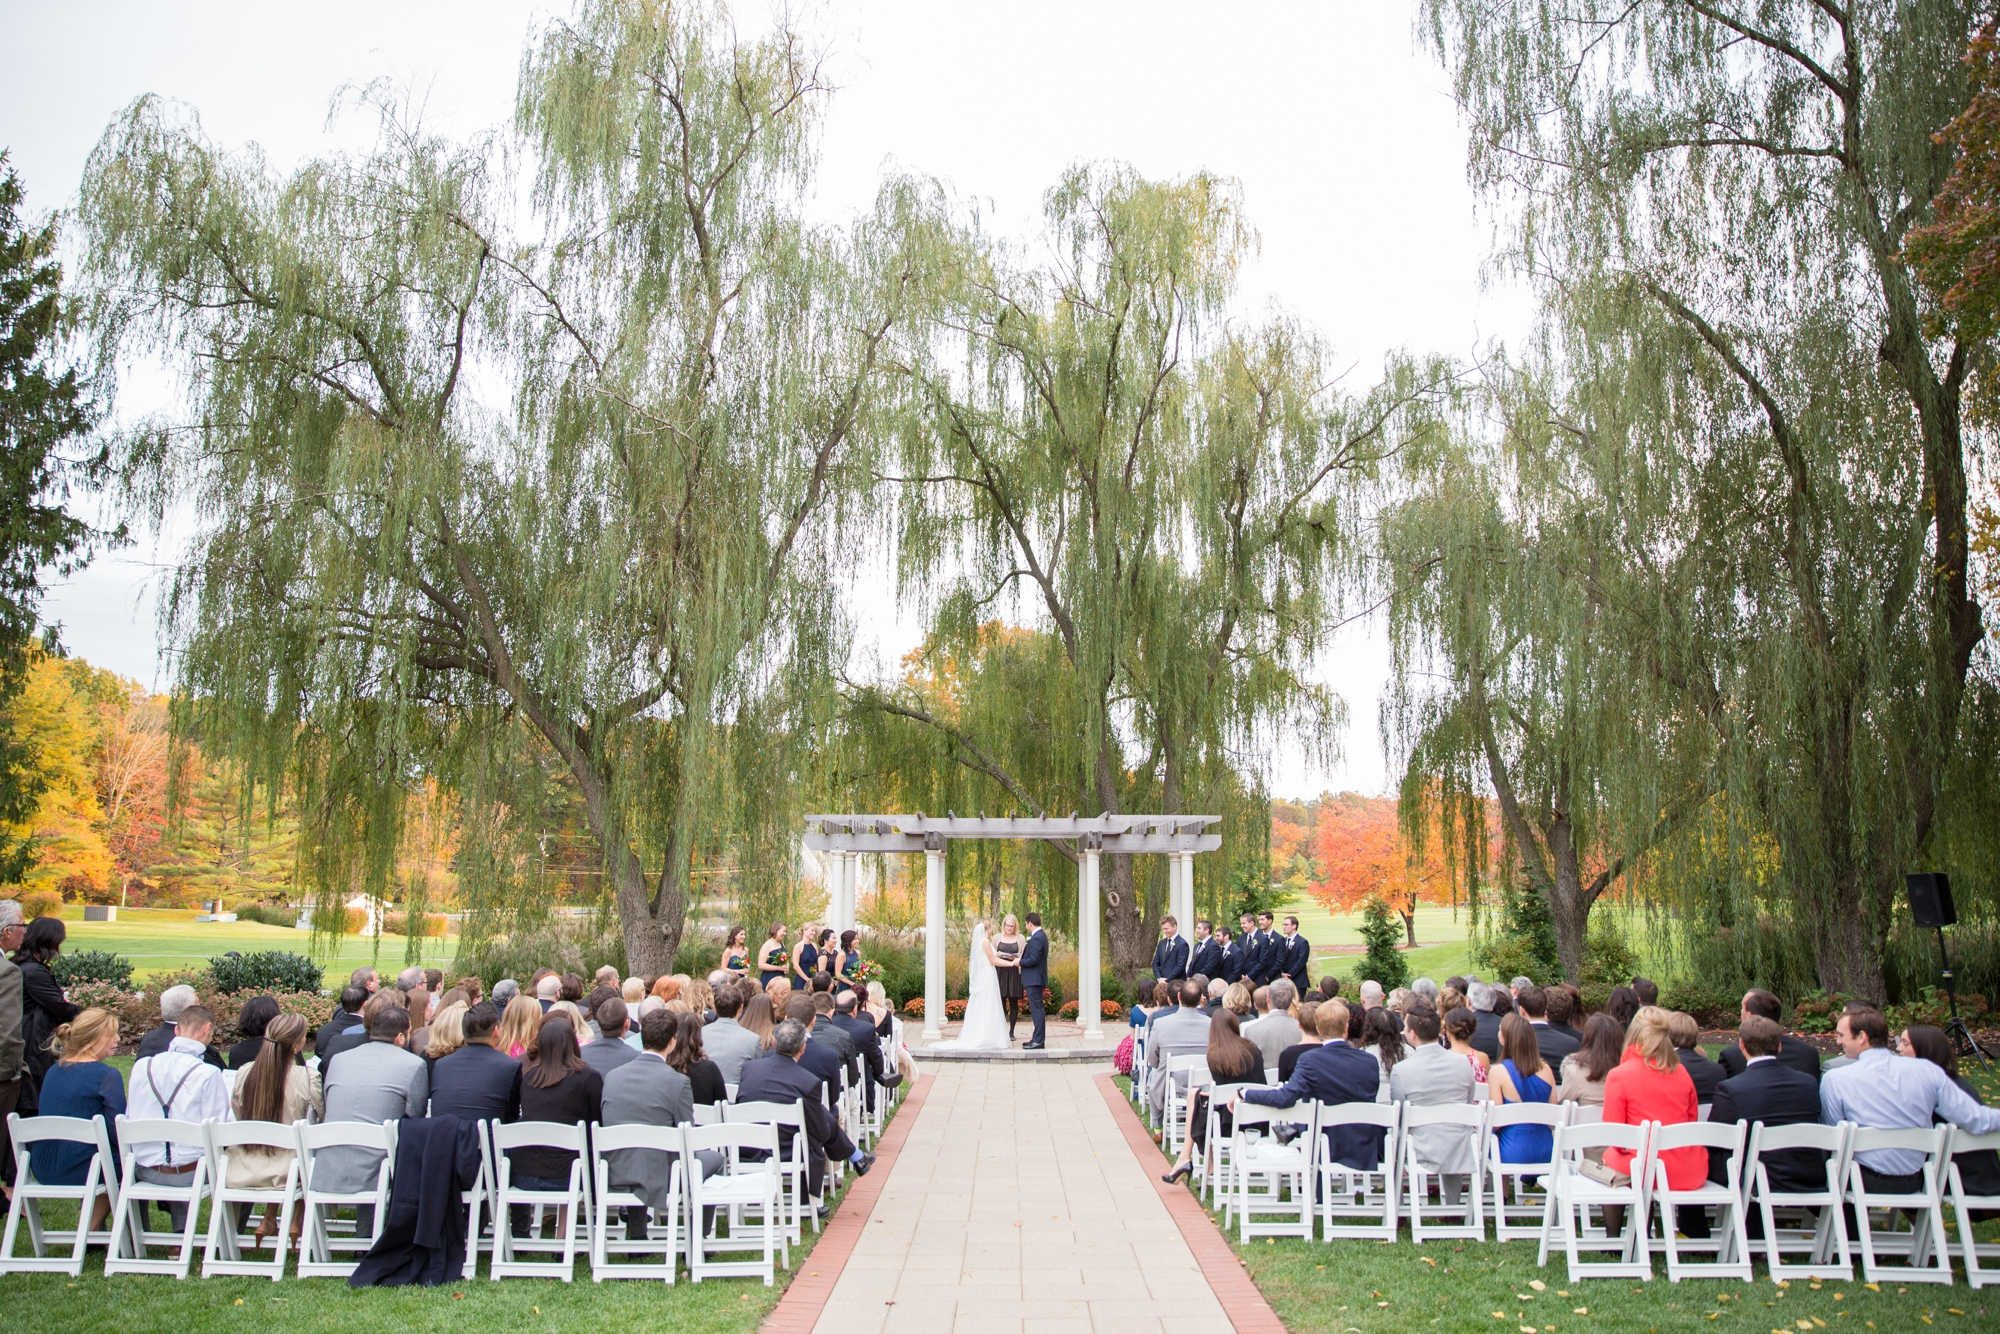 5-Finkel Wedding Ceremony-640_anna grace photography maryland wedding photographer turf valley.jpg